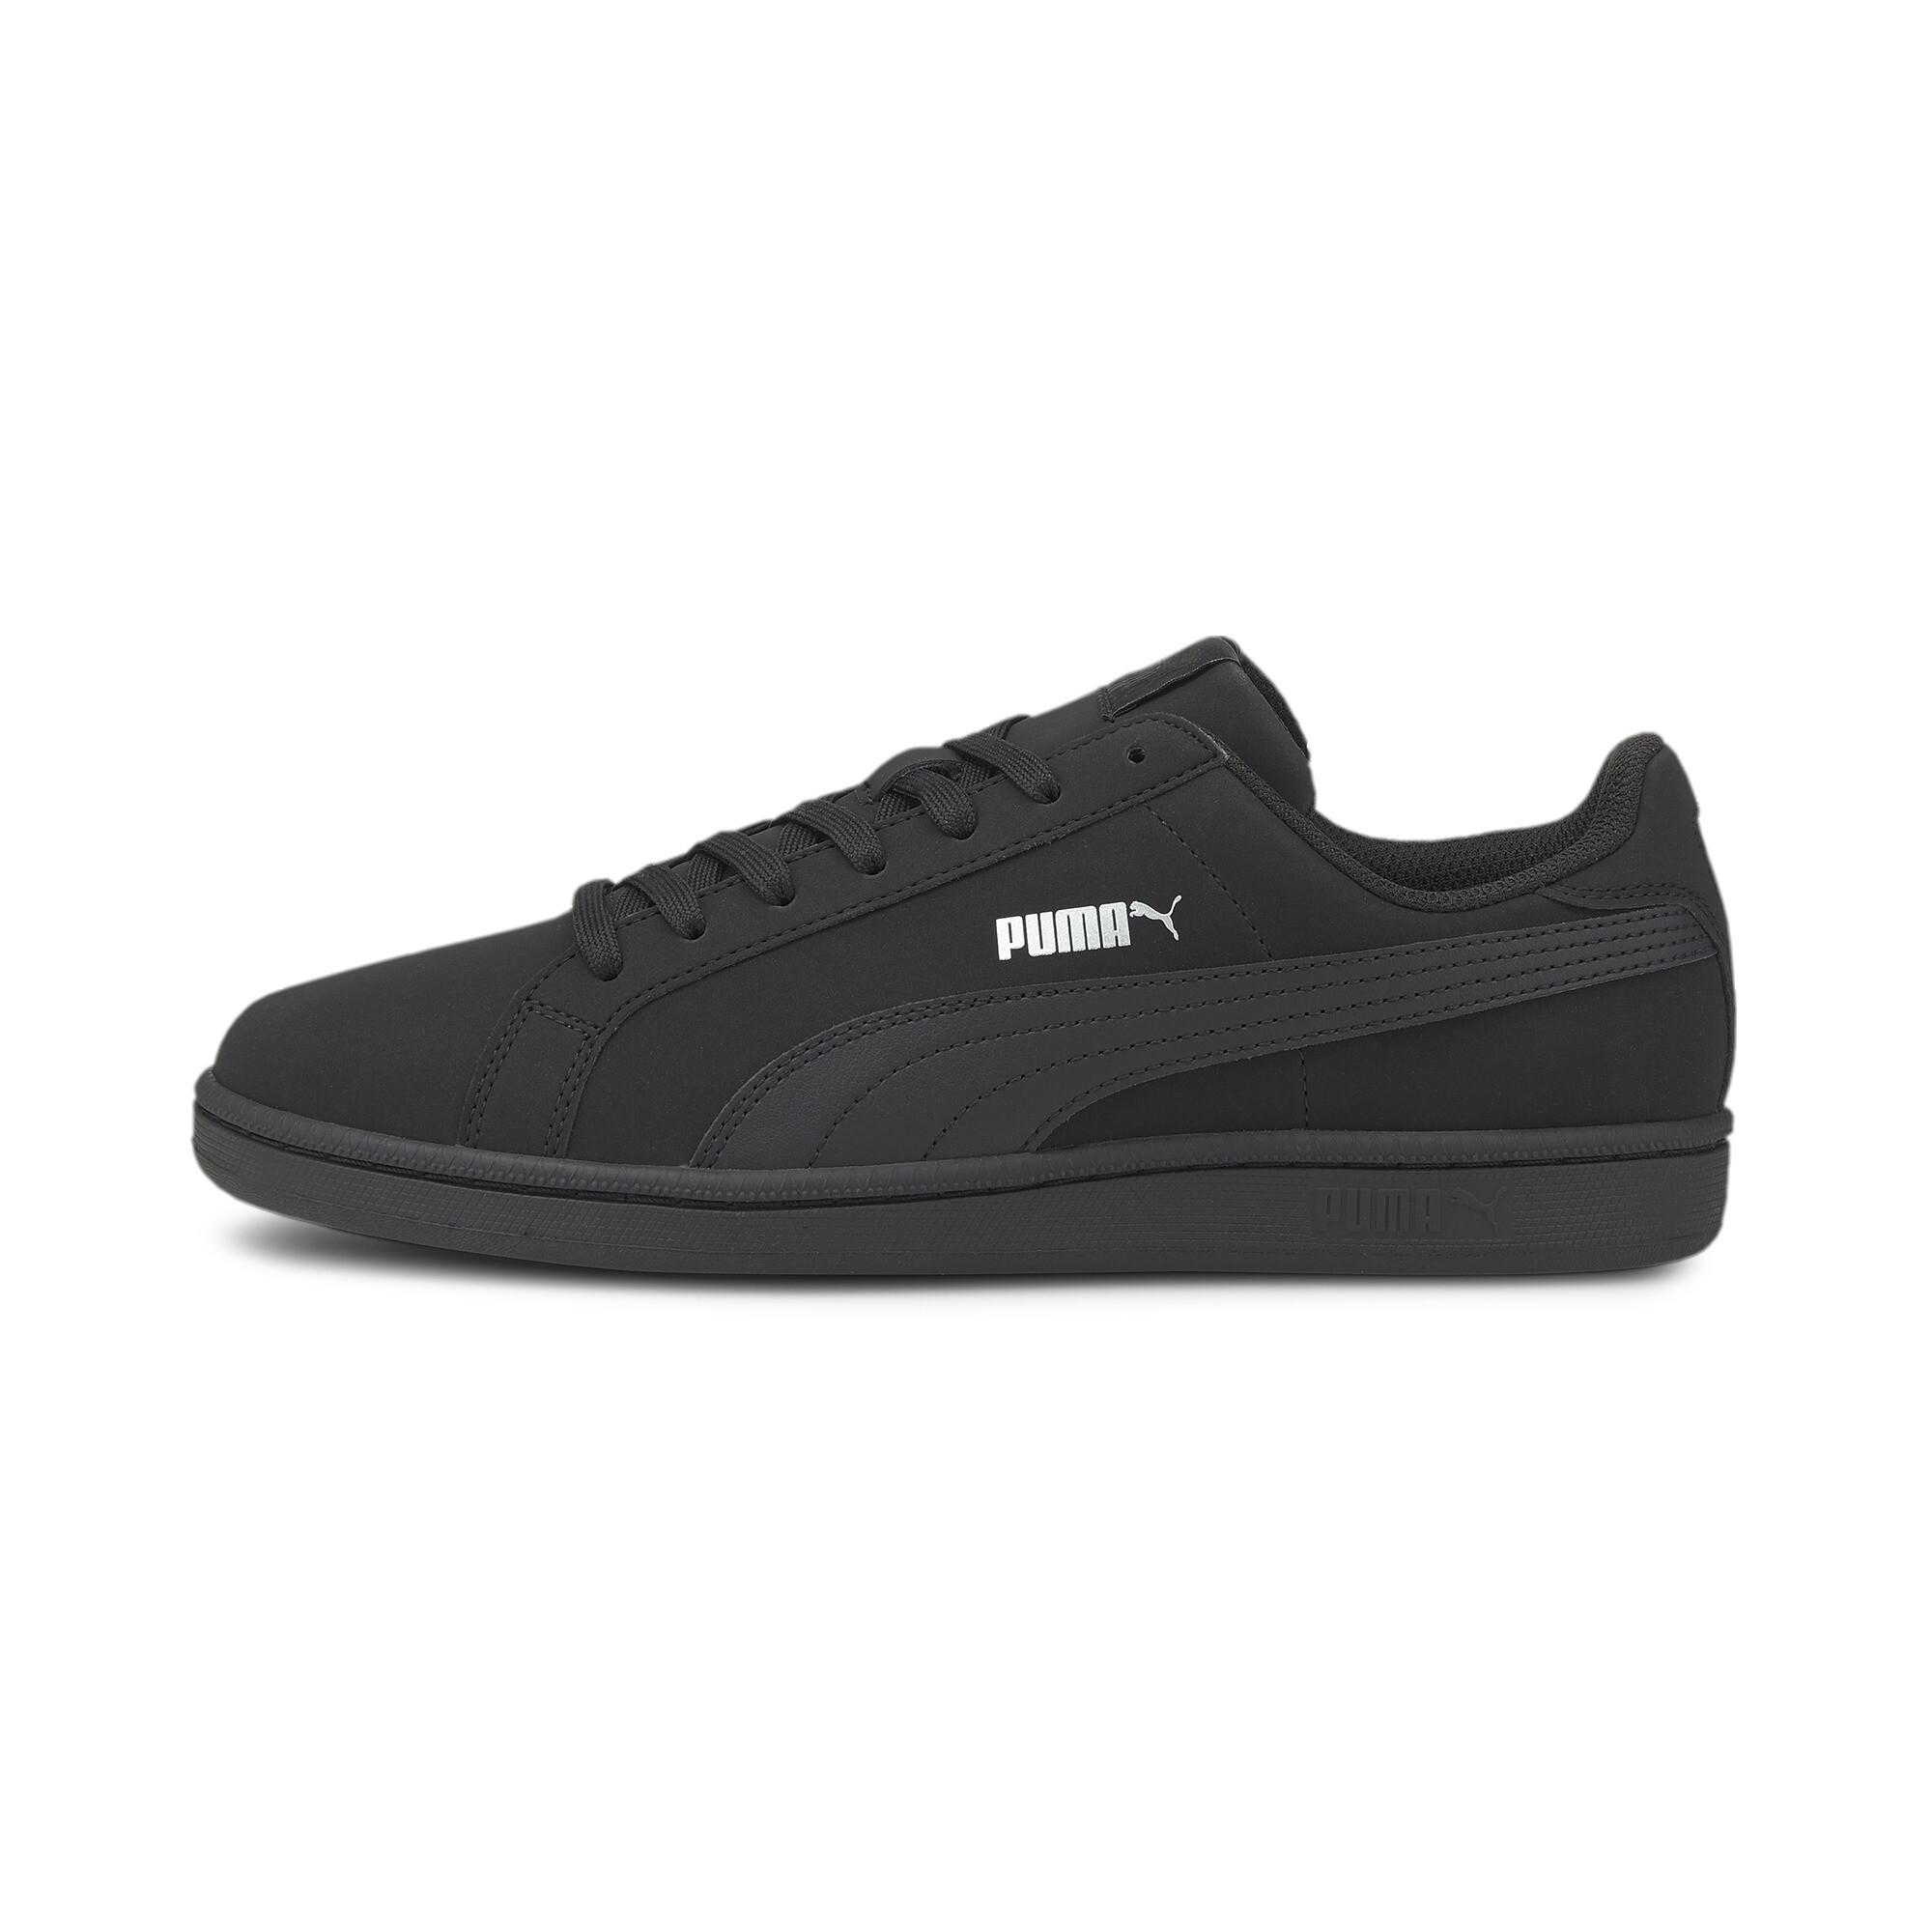 Indexbild 15 - PUMA Smash Buck Sneaker Unisex Schuhe Sport Classics Neu